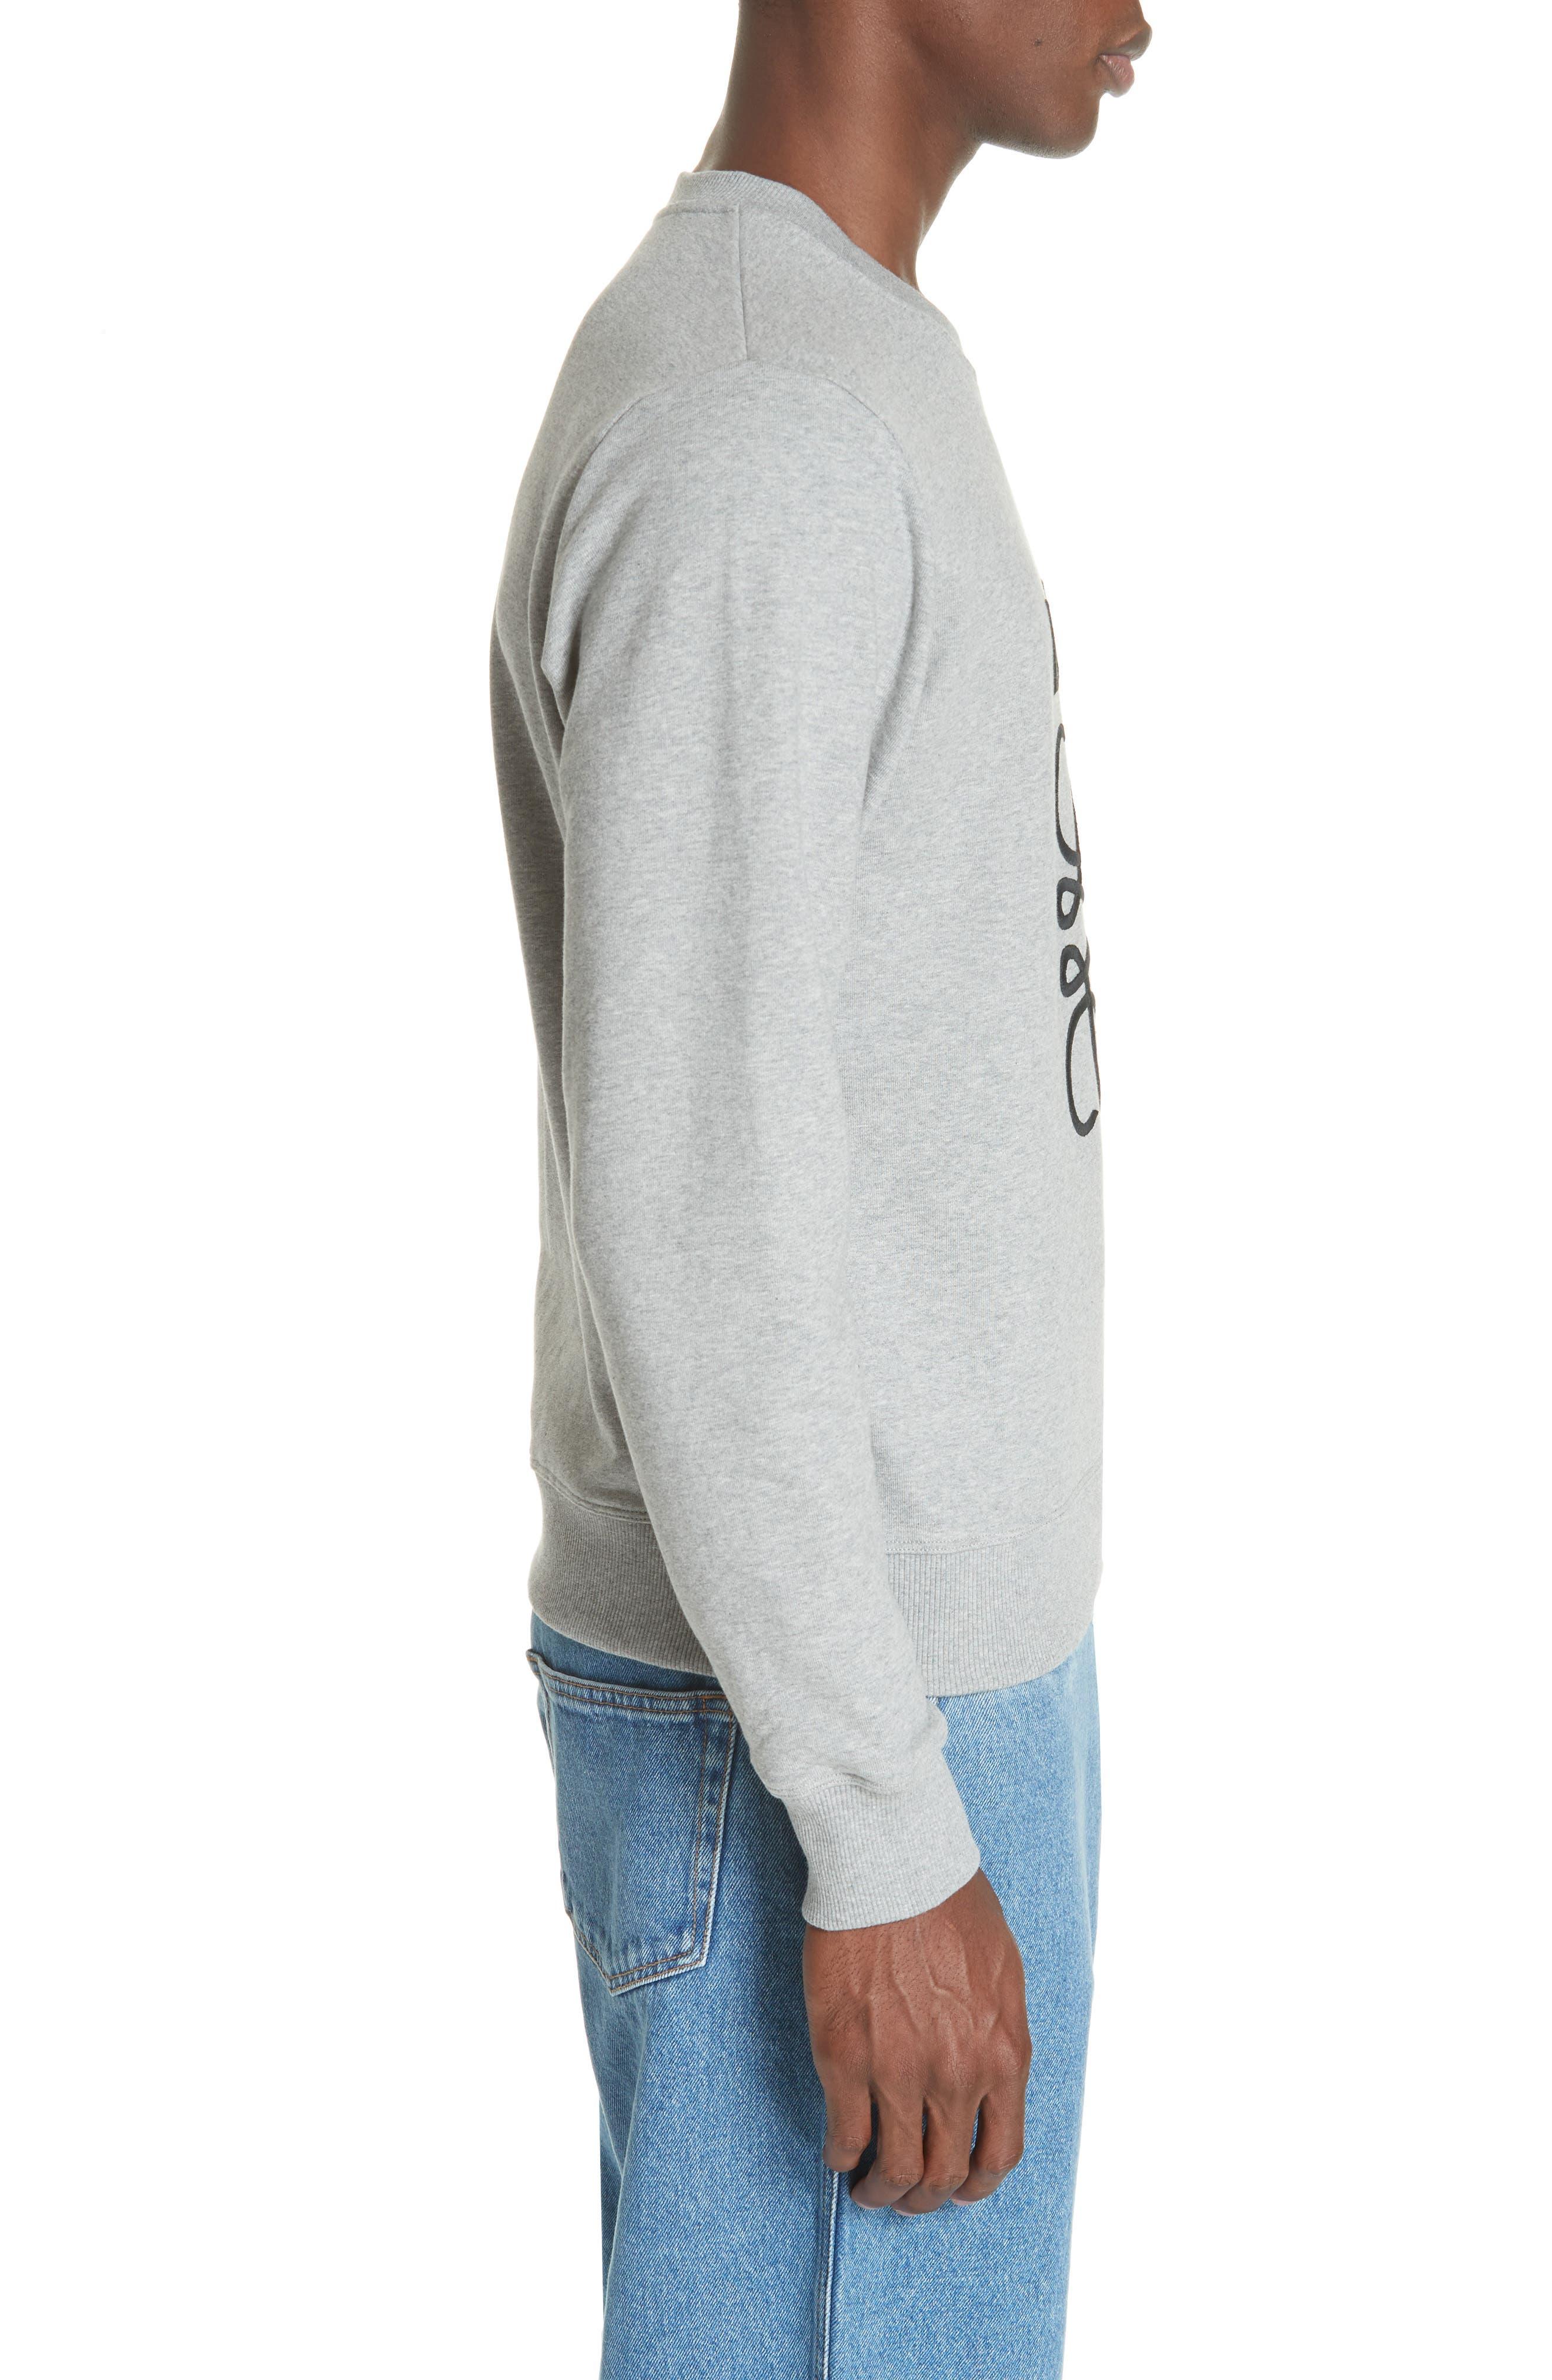 LOEWE, Embroidered Anagram Logo Sweatshirt, Alternate thumbnail 3, color, 1120 GREY